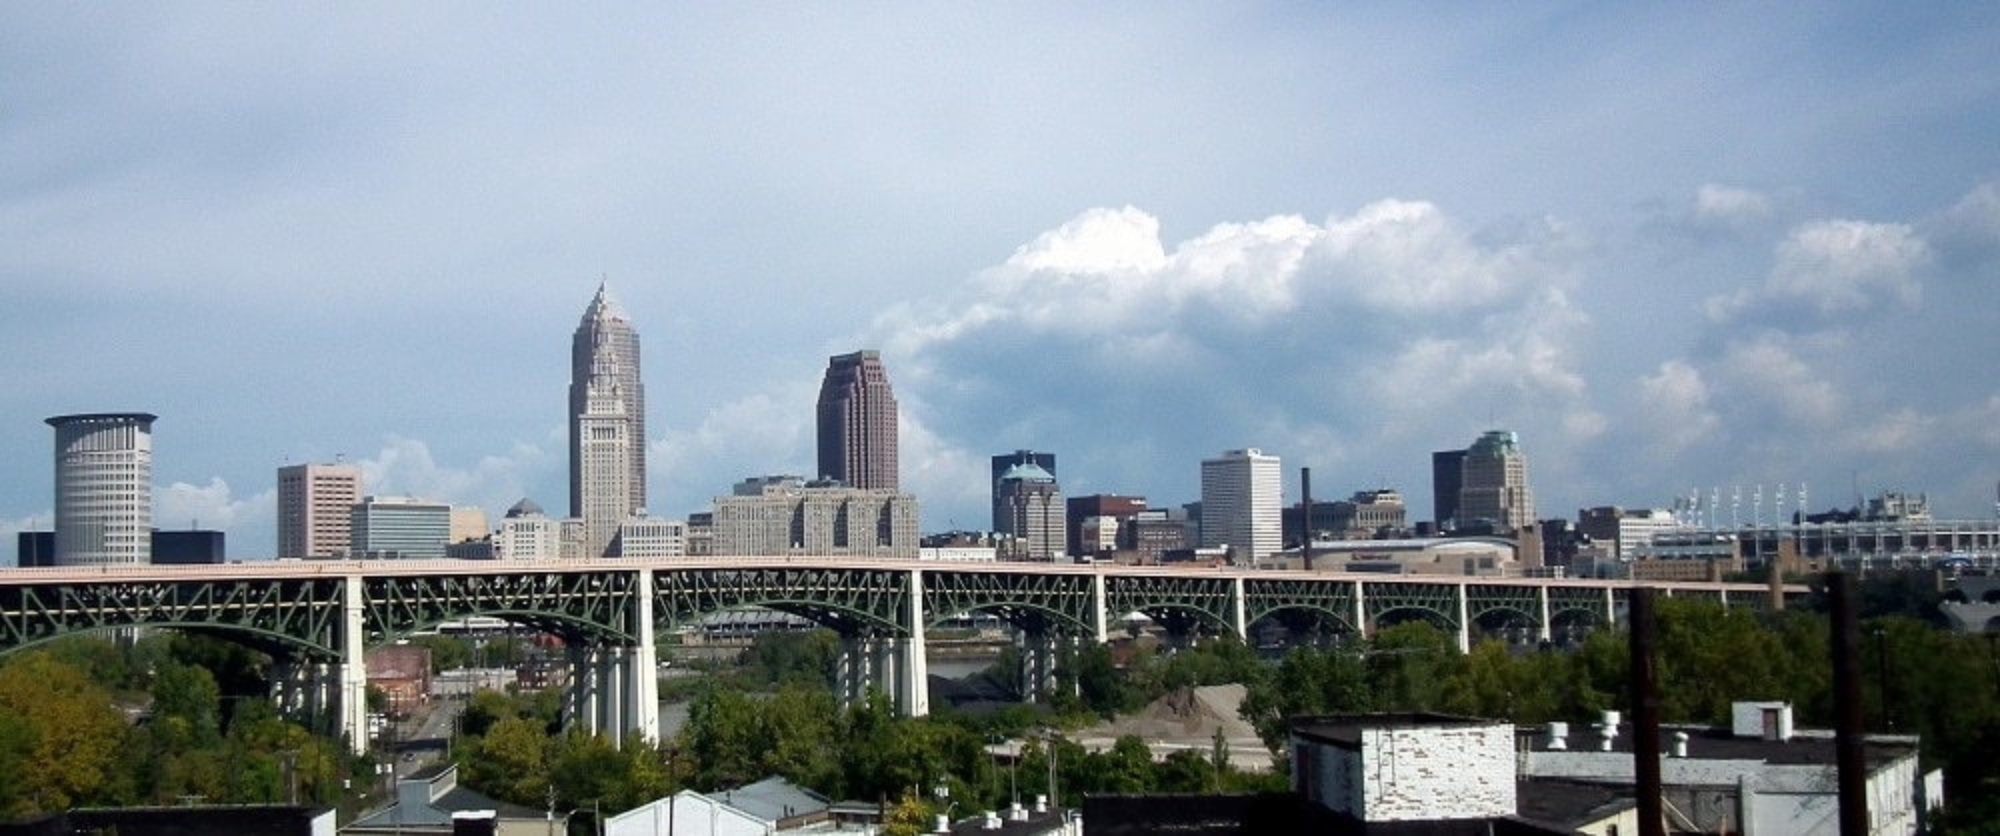 Brancher dans Cleveland Ohio